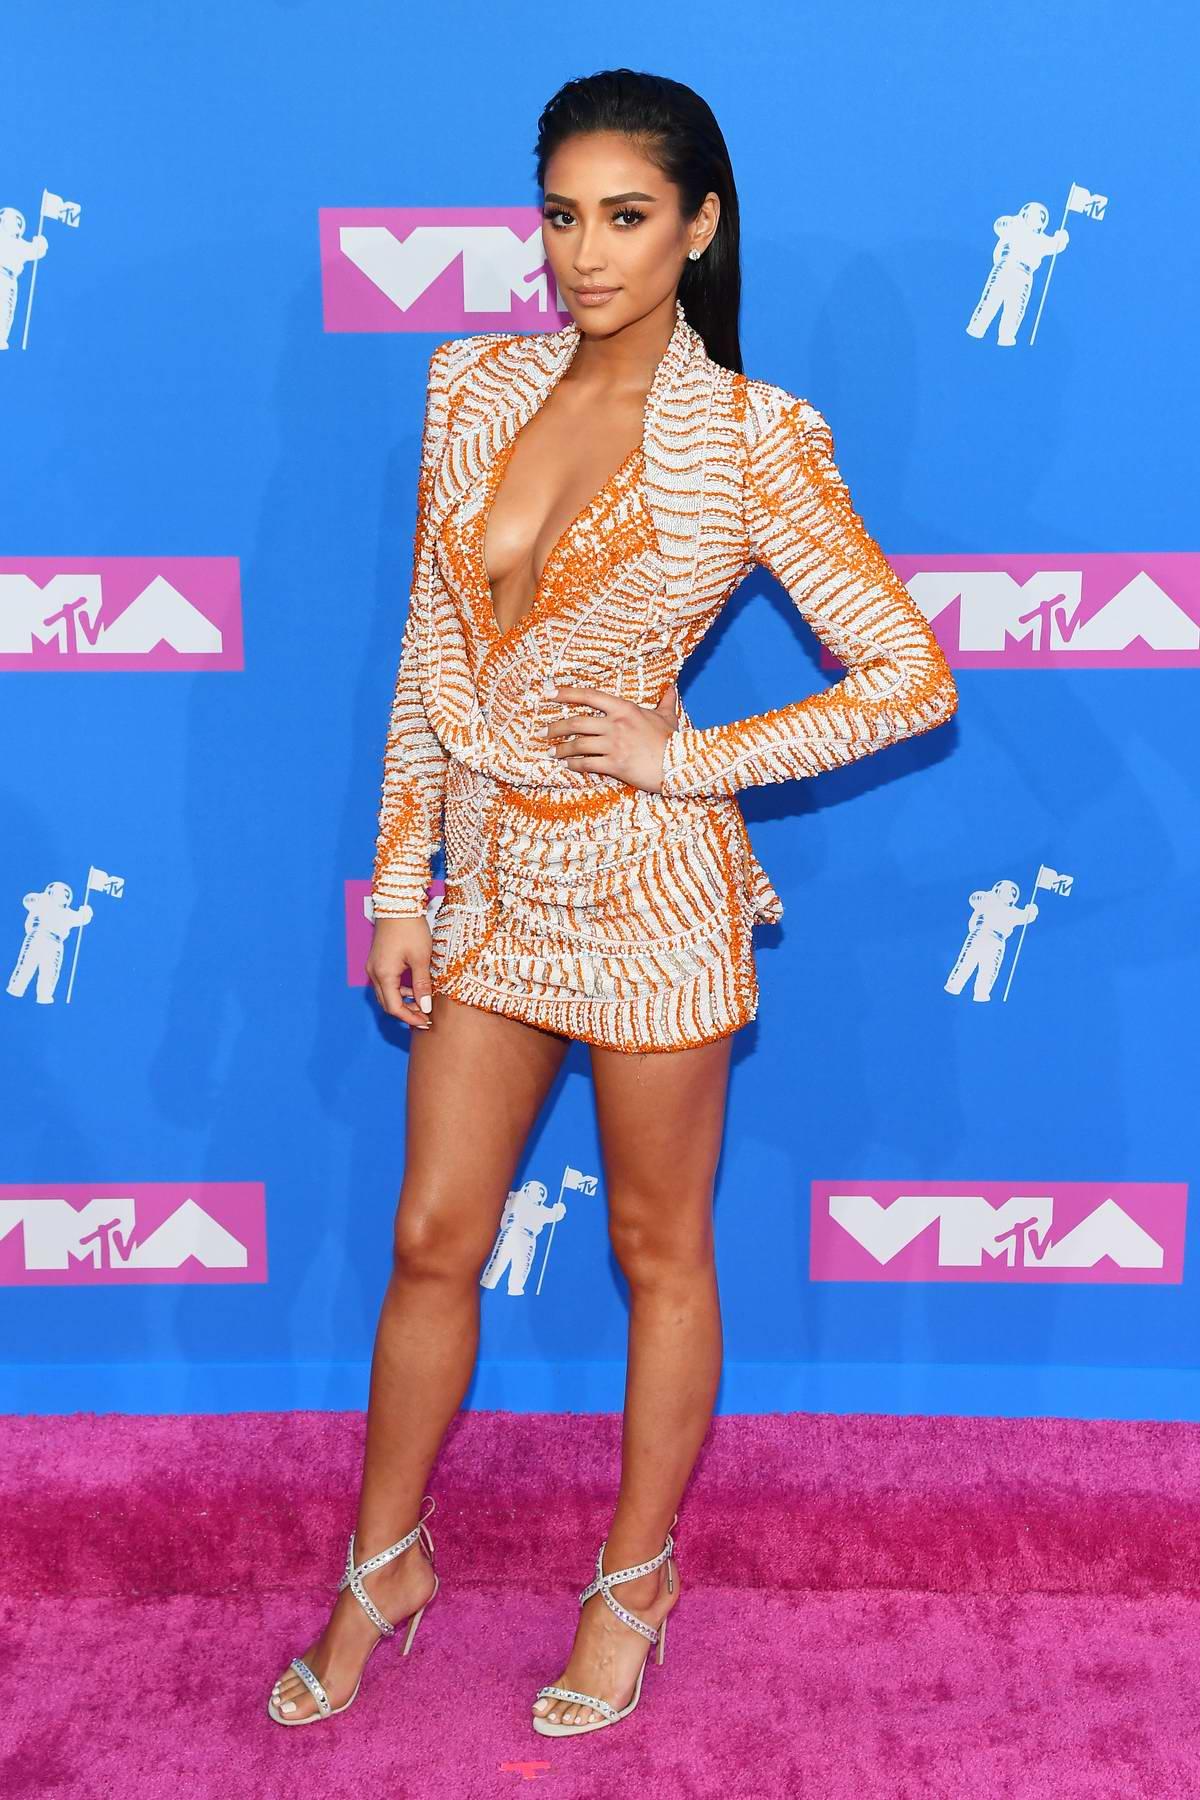 Shay Mitchell attends 2018 MTV Video Music Awards (MTV VMA 2018) at Radio City Music Hall in New York City